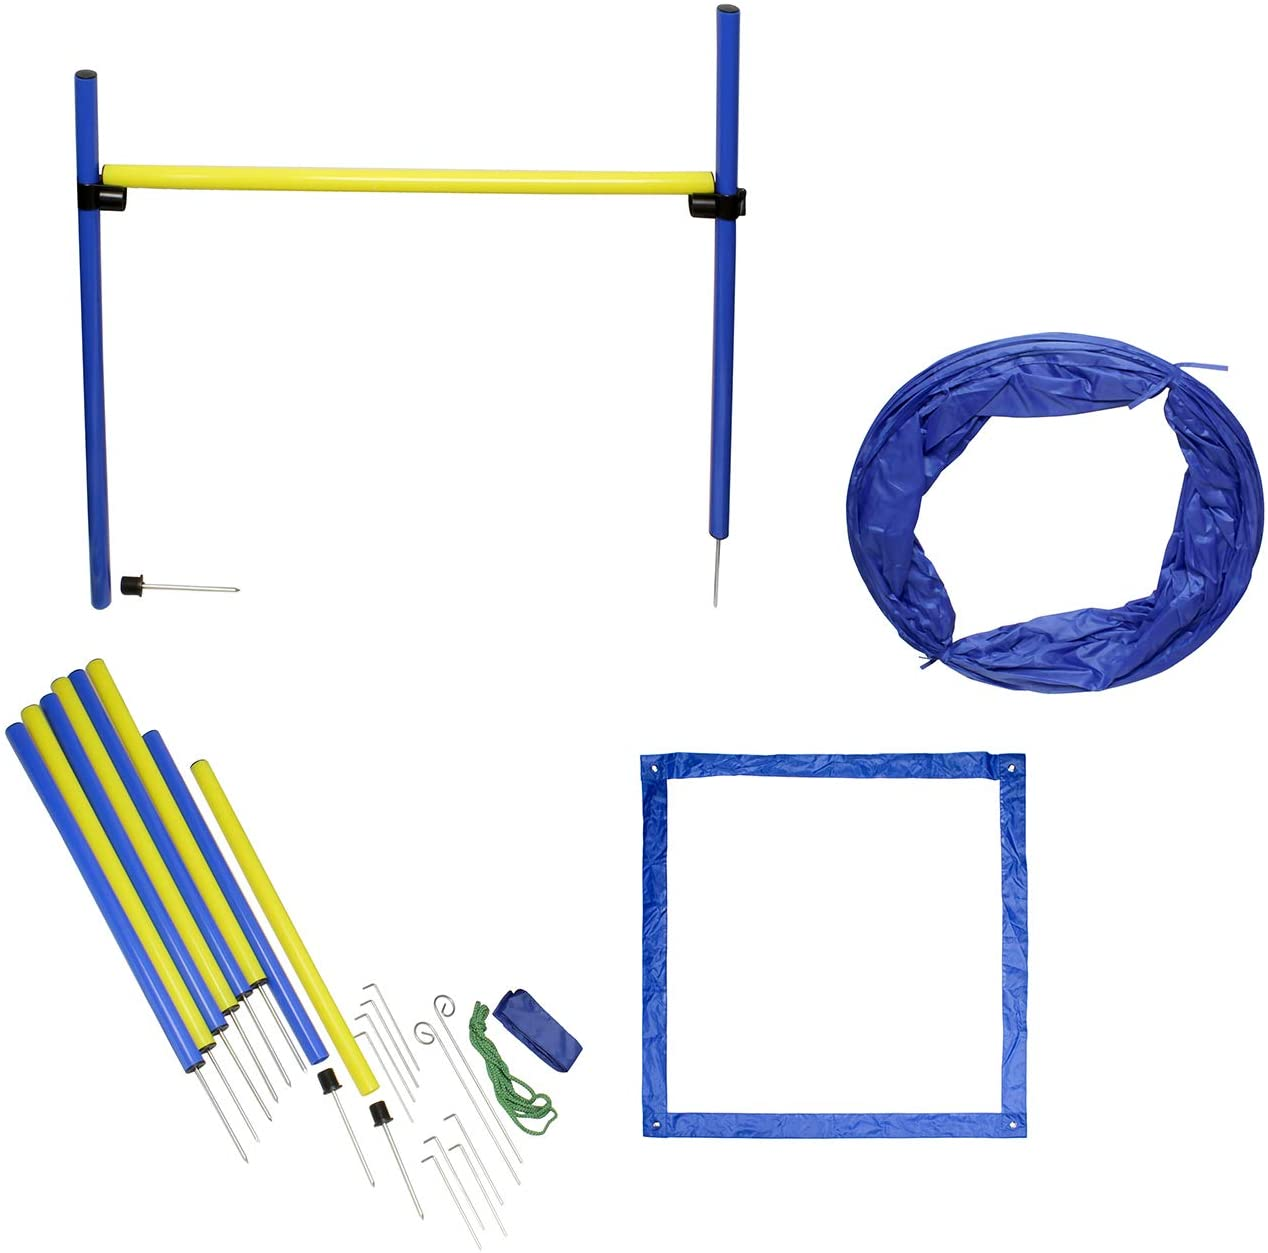 MiMu Dog Agility Training Equipment Kit